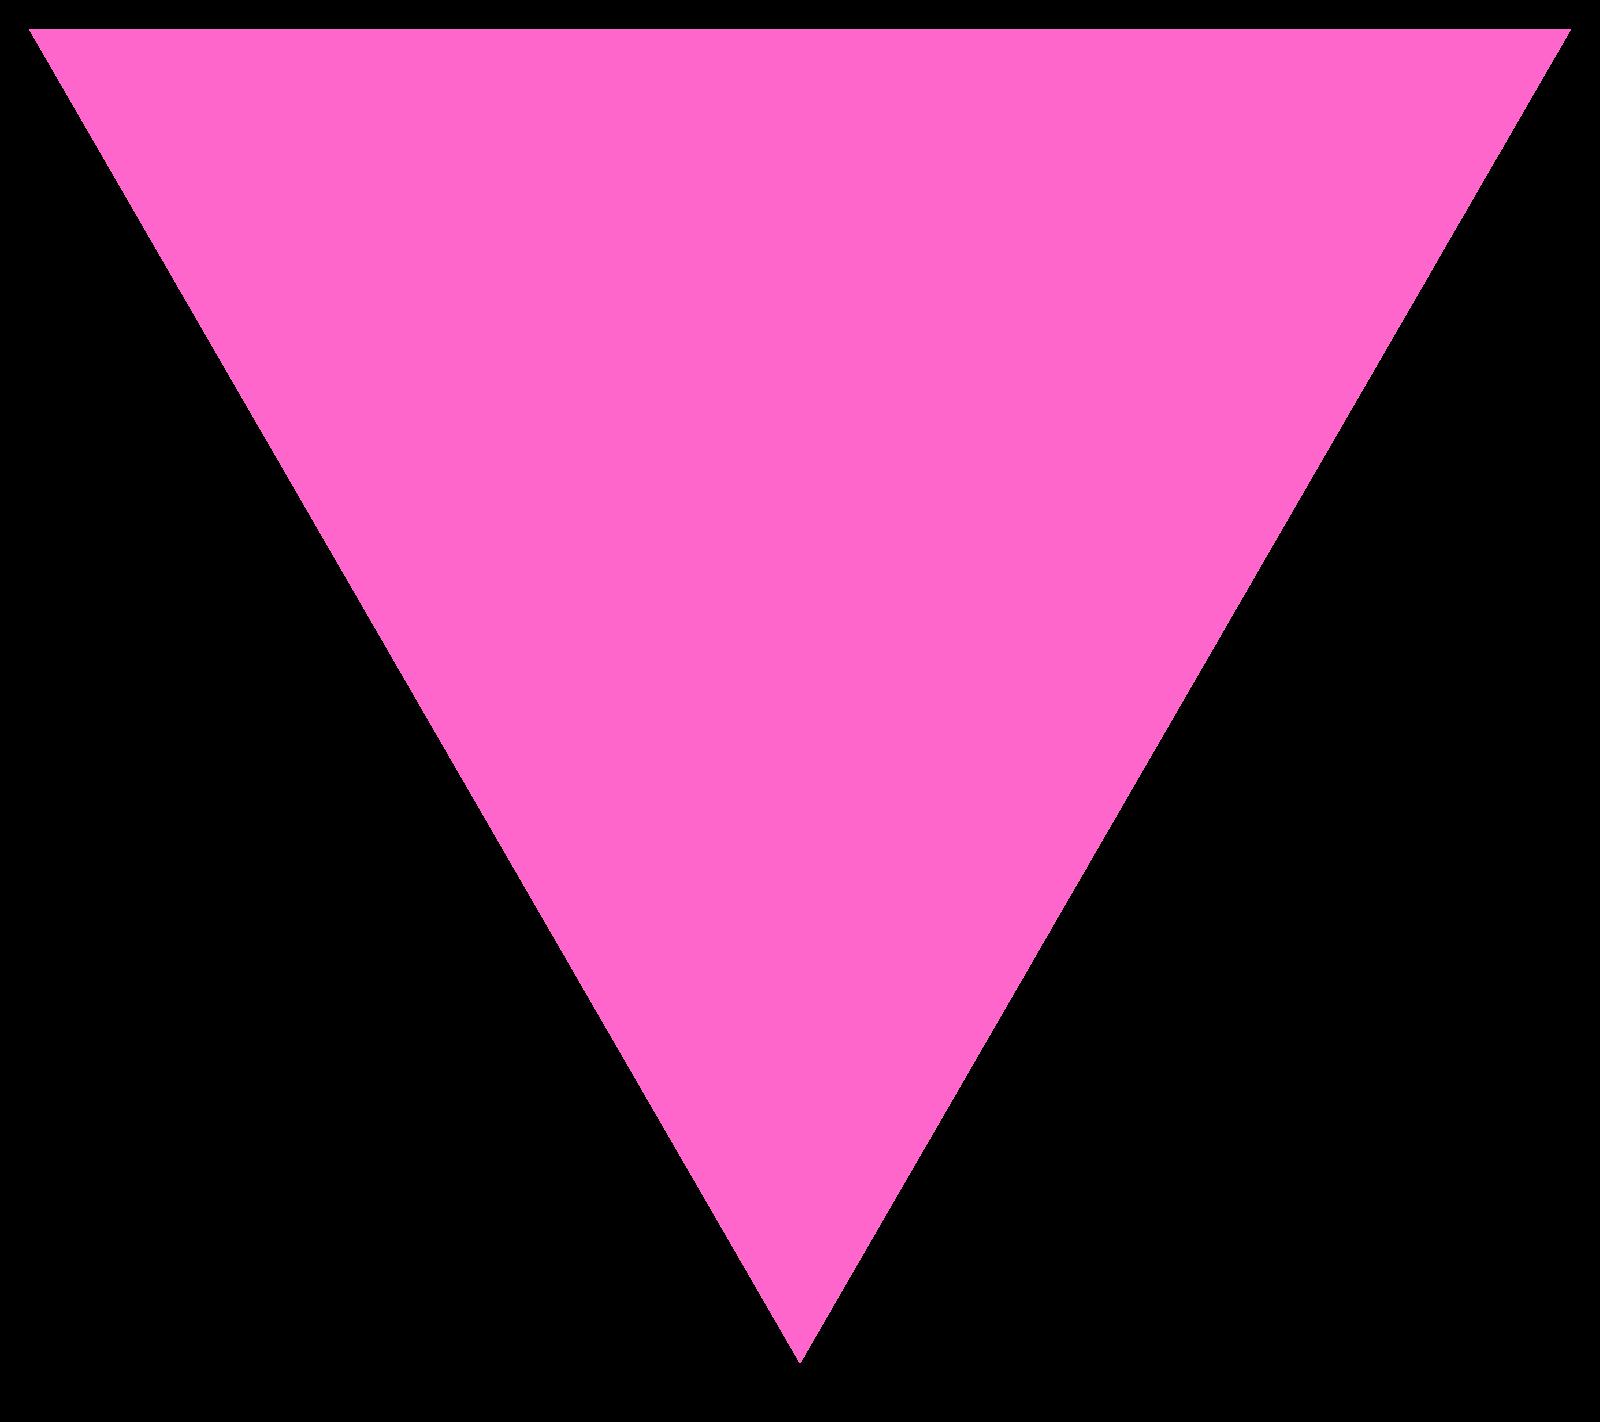 triangular clipart pink triangle